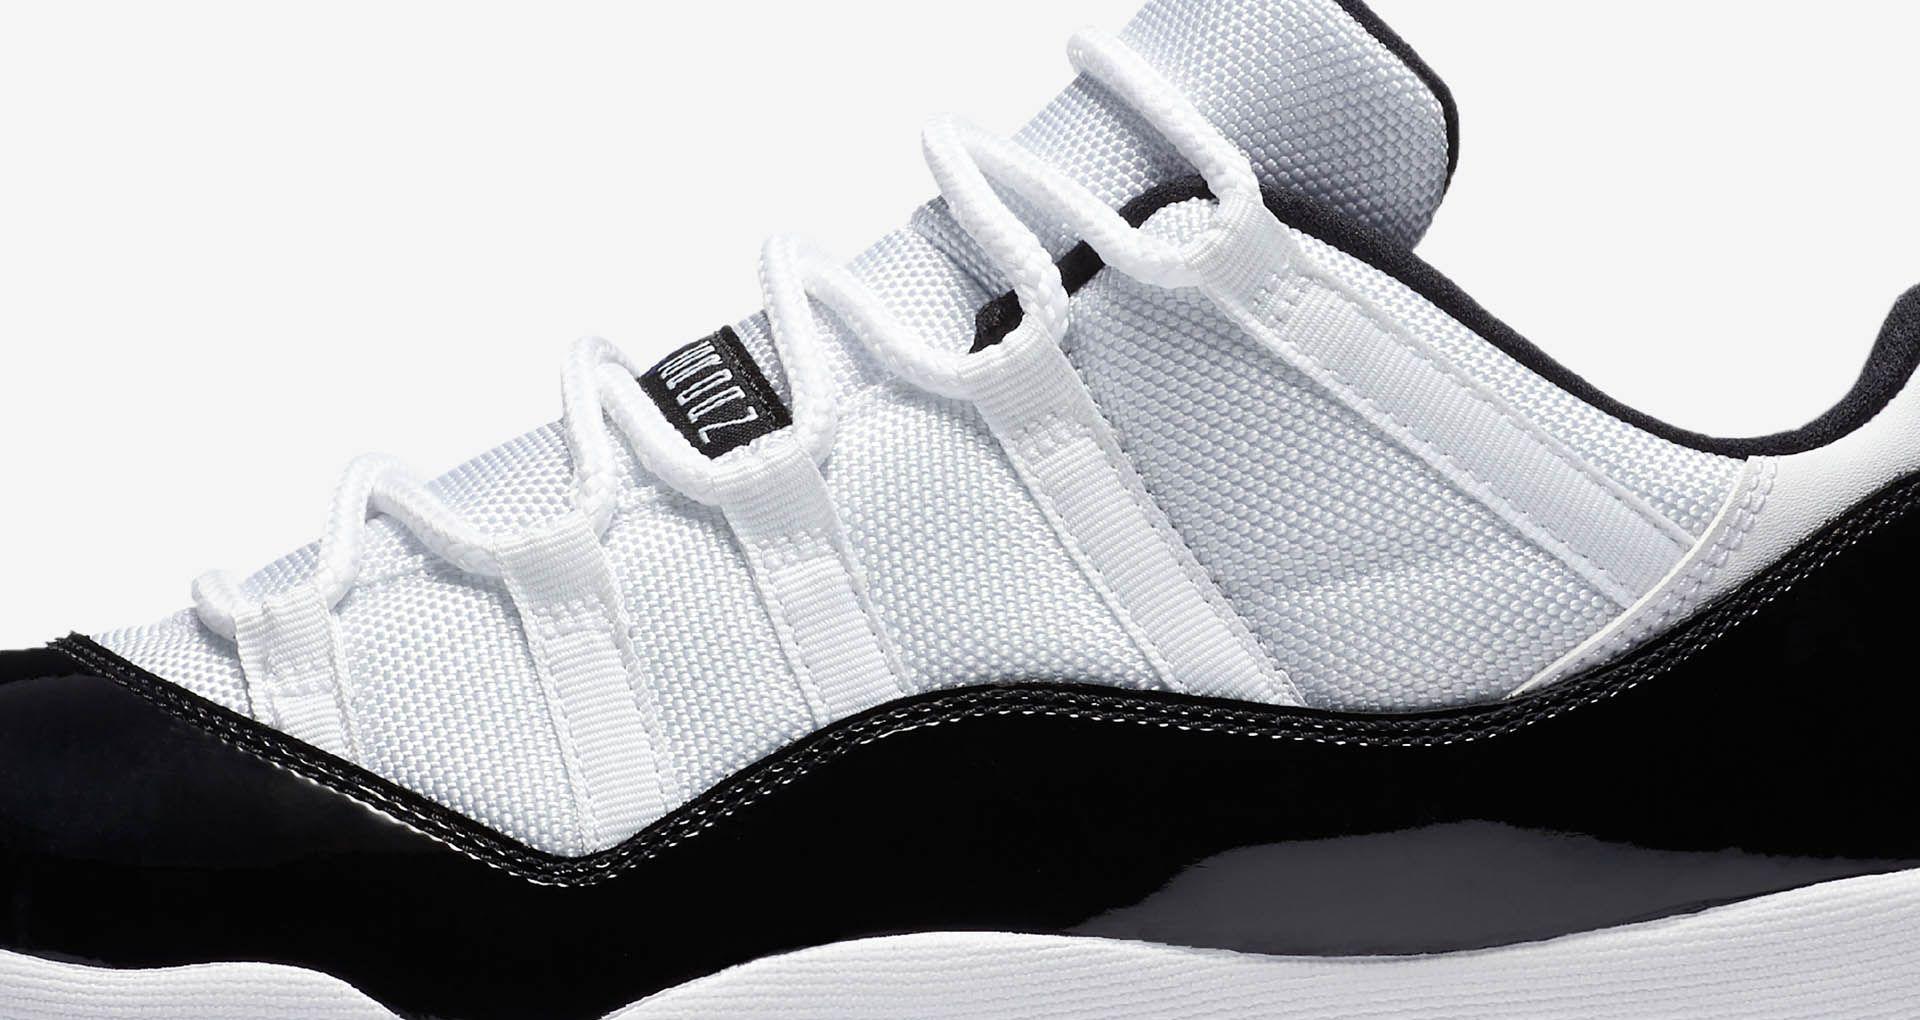 buy online 295b6 00366 Air Jordan 11 Retro Low 'Concord'. Release Date. Nike+ SNKRS